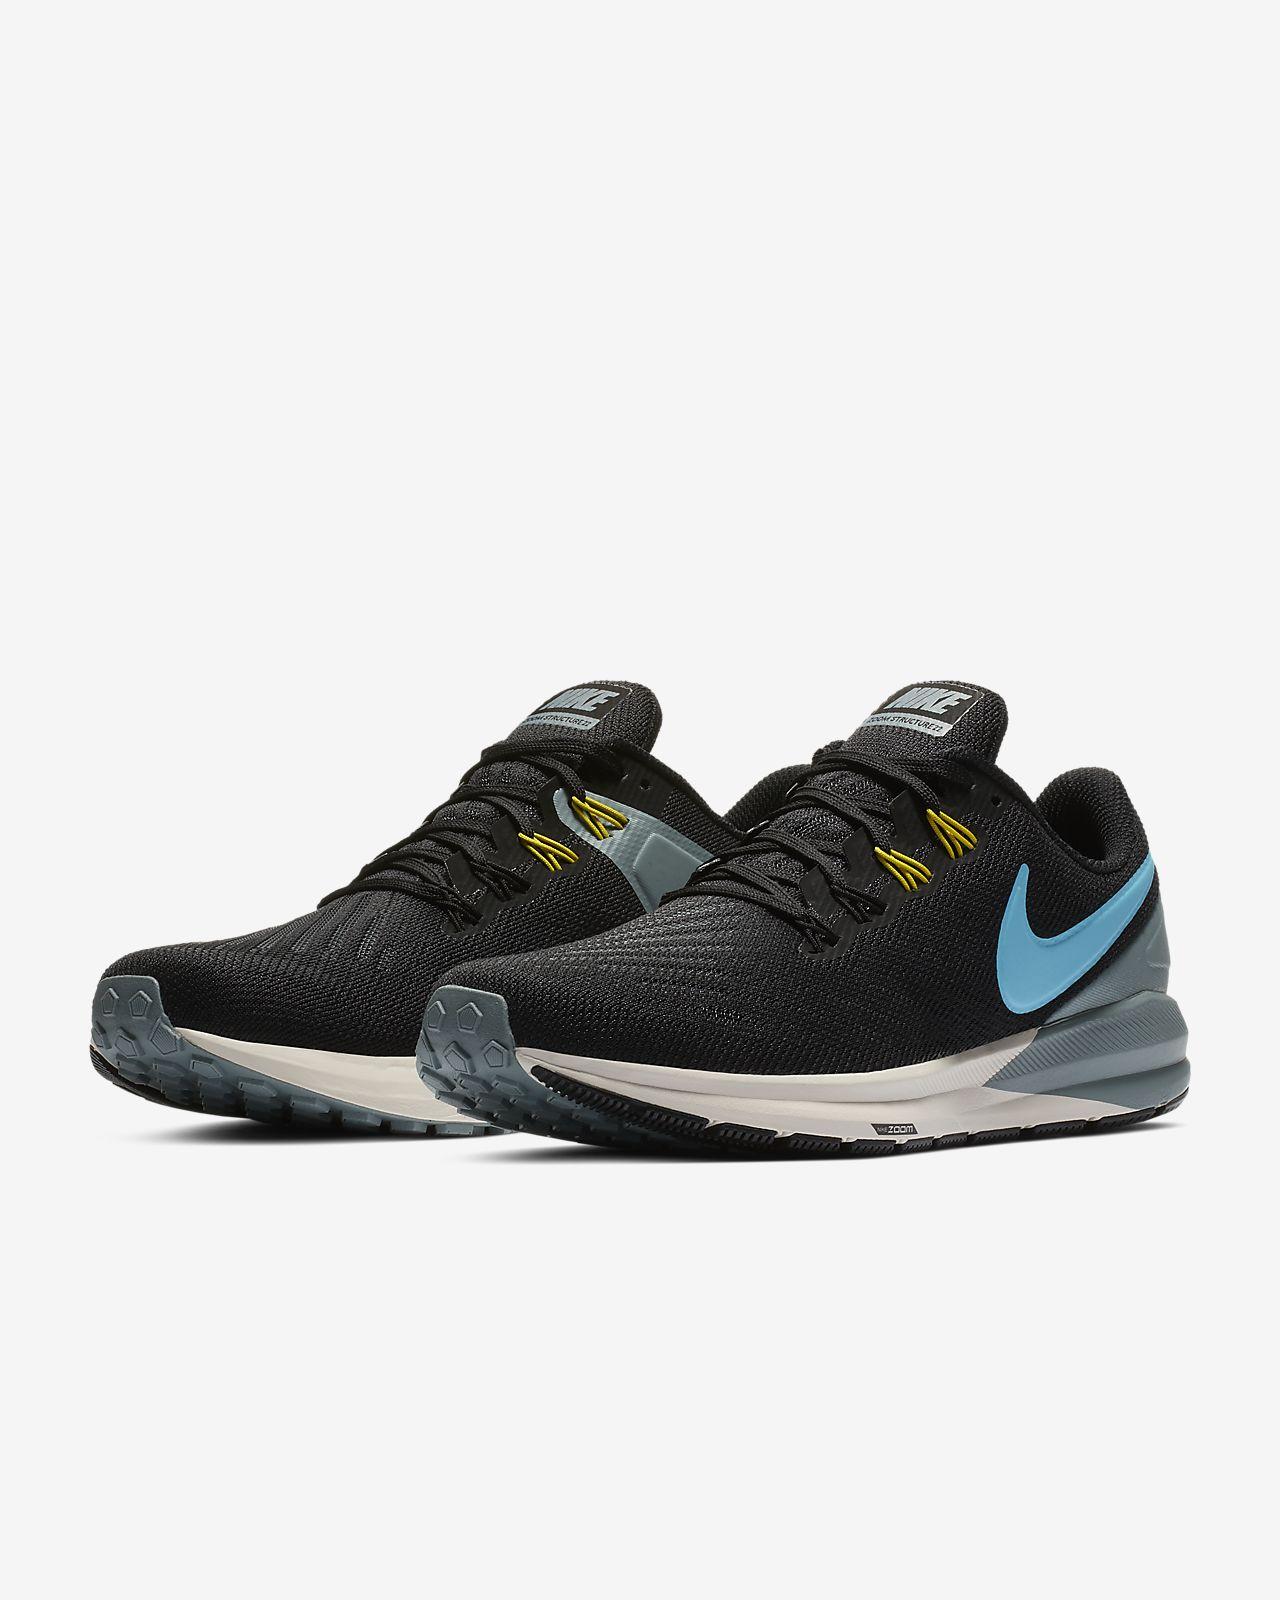 114ce0f3d482 Nike Air Zoom Structure 22 Men s Running Shoe. Nike.com PT